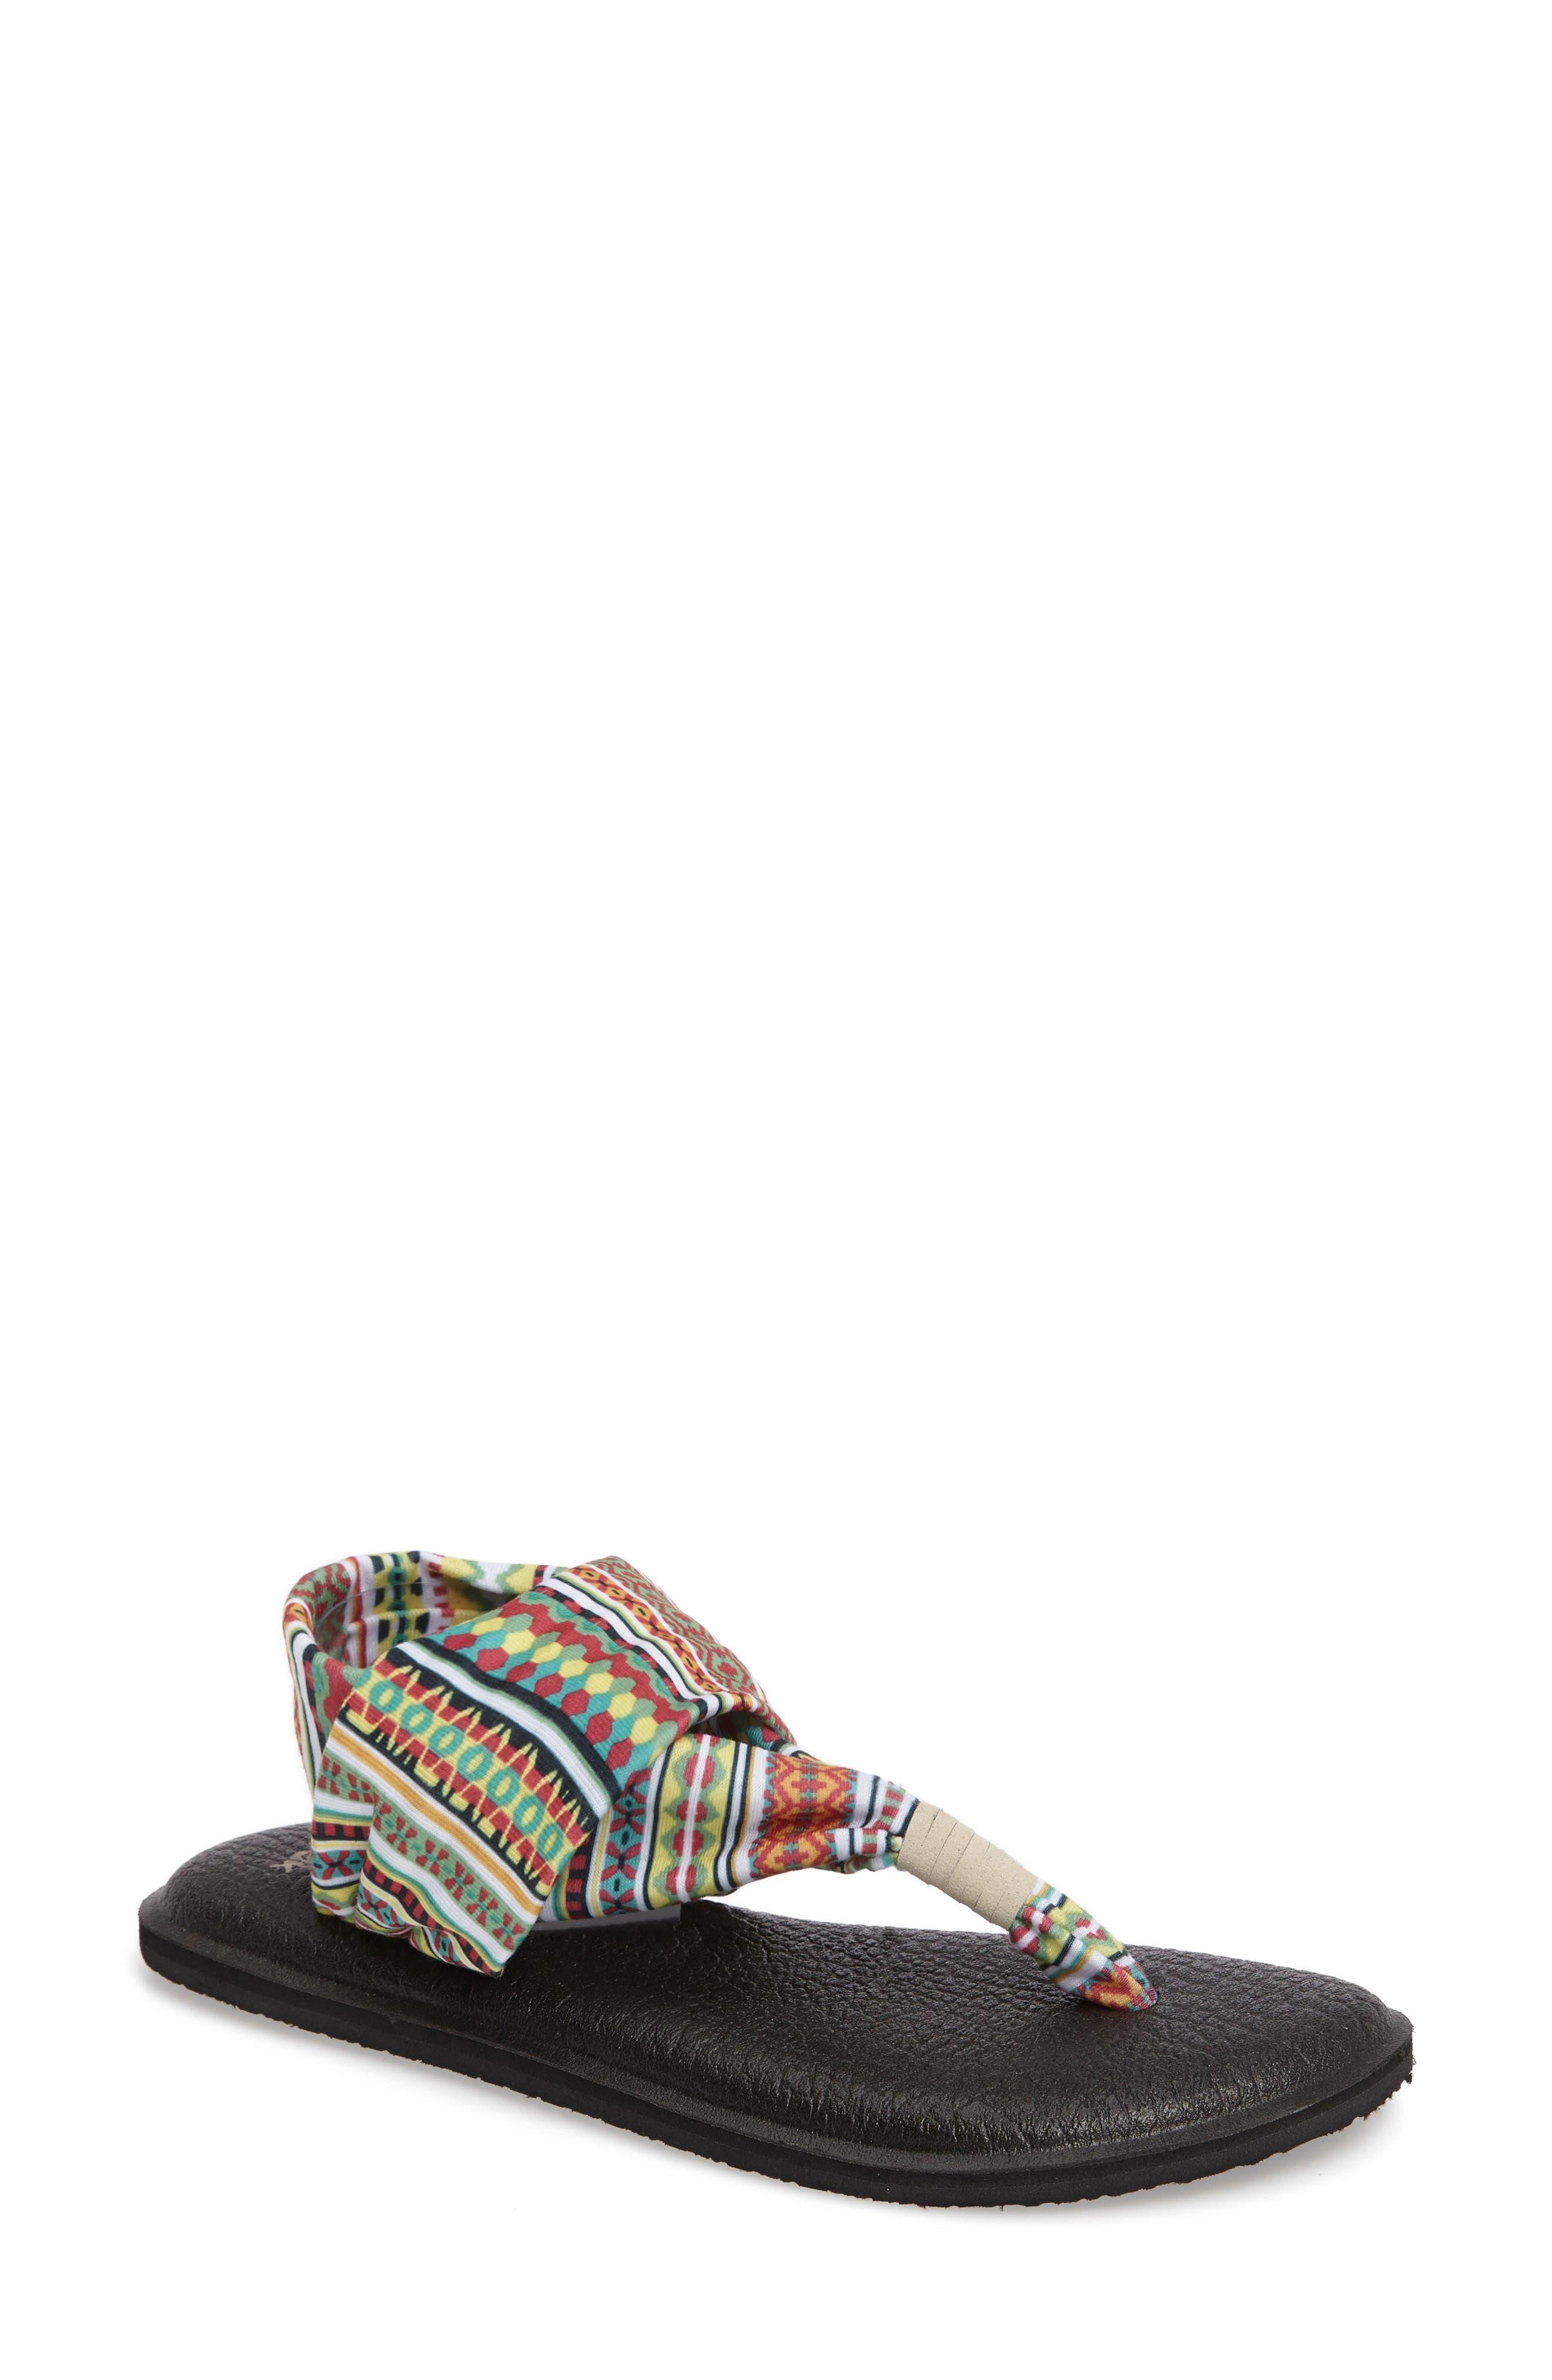 Main Image - Sanuk 'Yoga Sling 2' Sandal